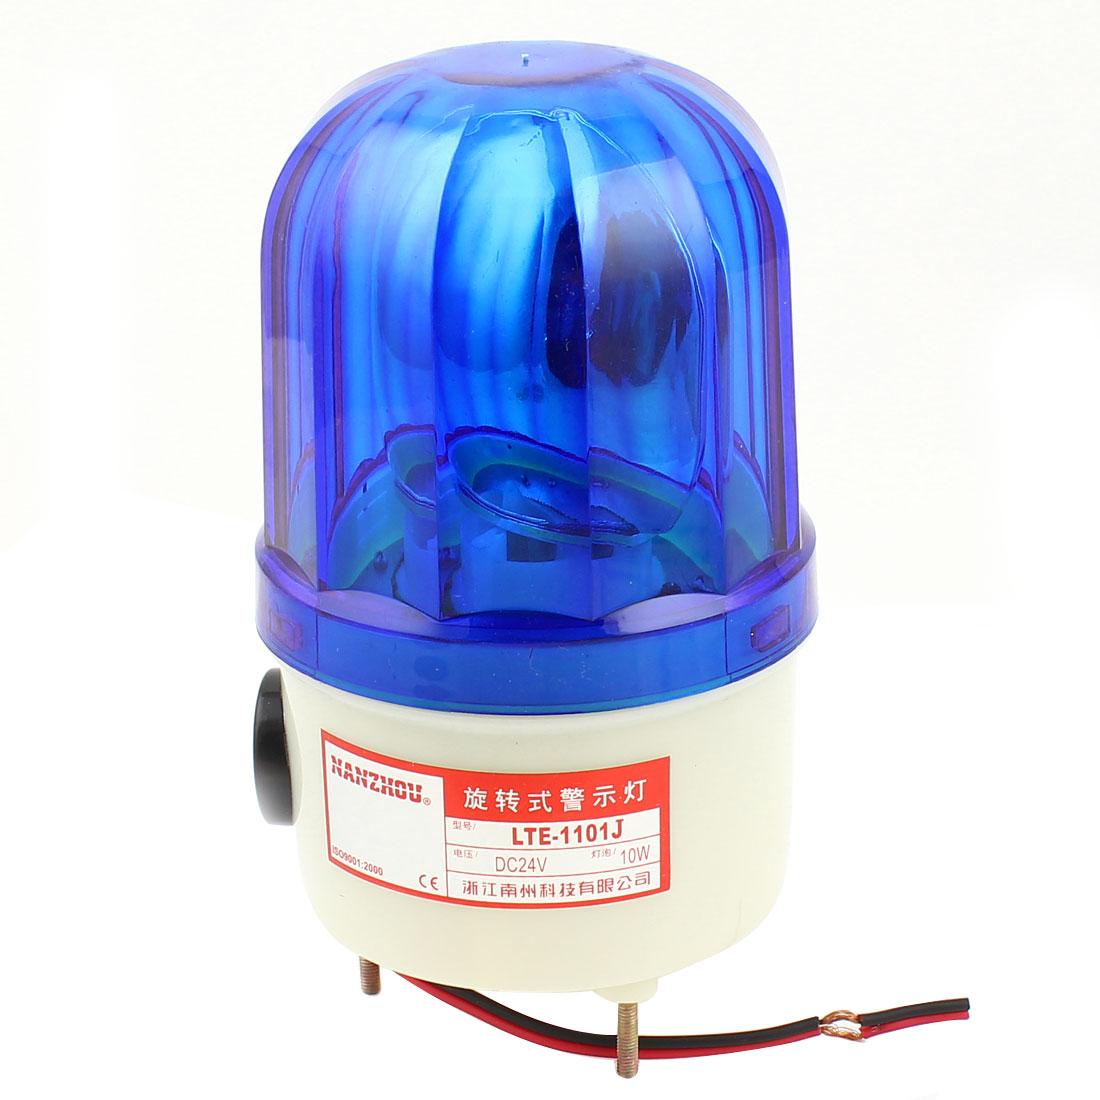 LTE-1101J DC 24V 10W Industrial Blue Rotator Rotary Lamp Warning Light Beacon